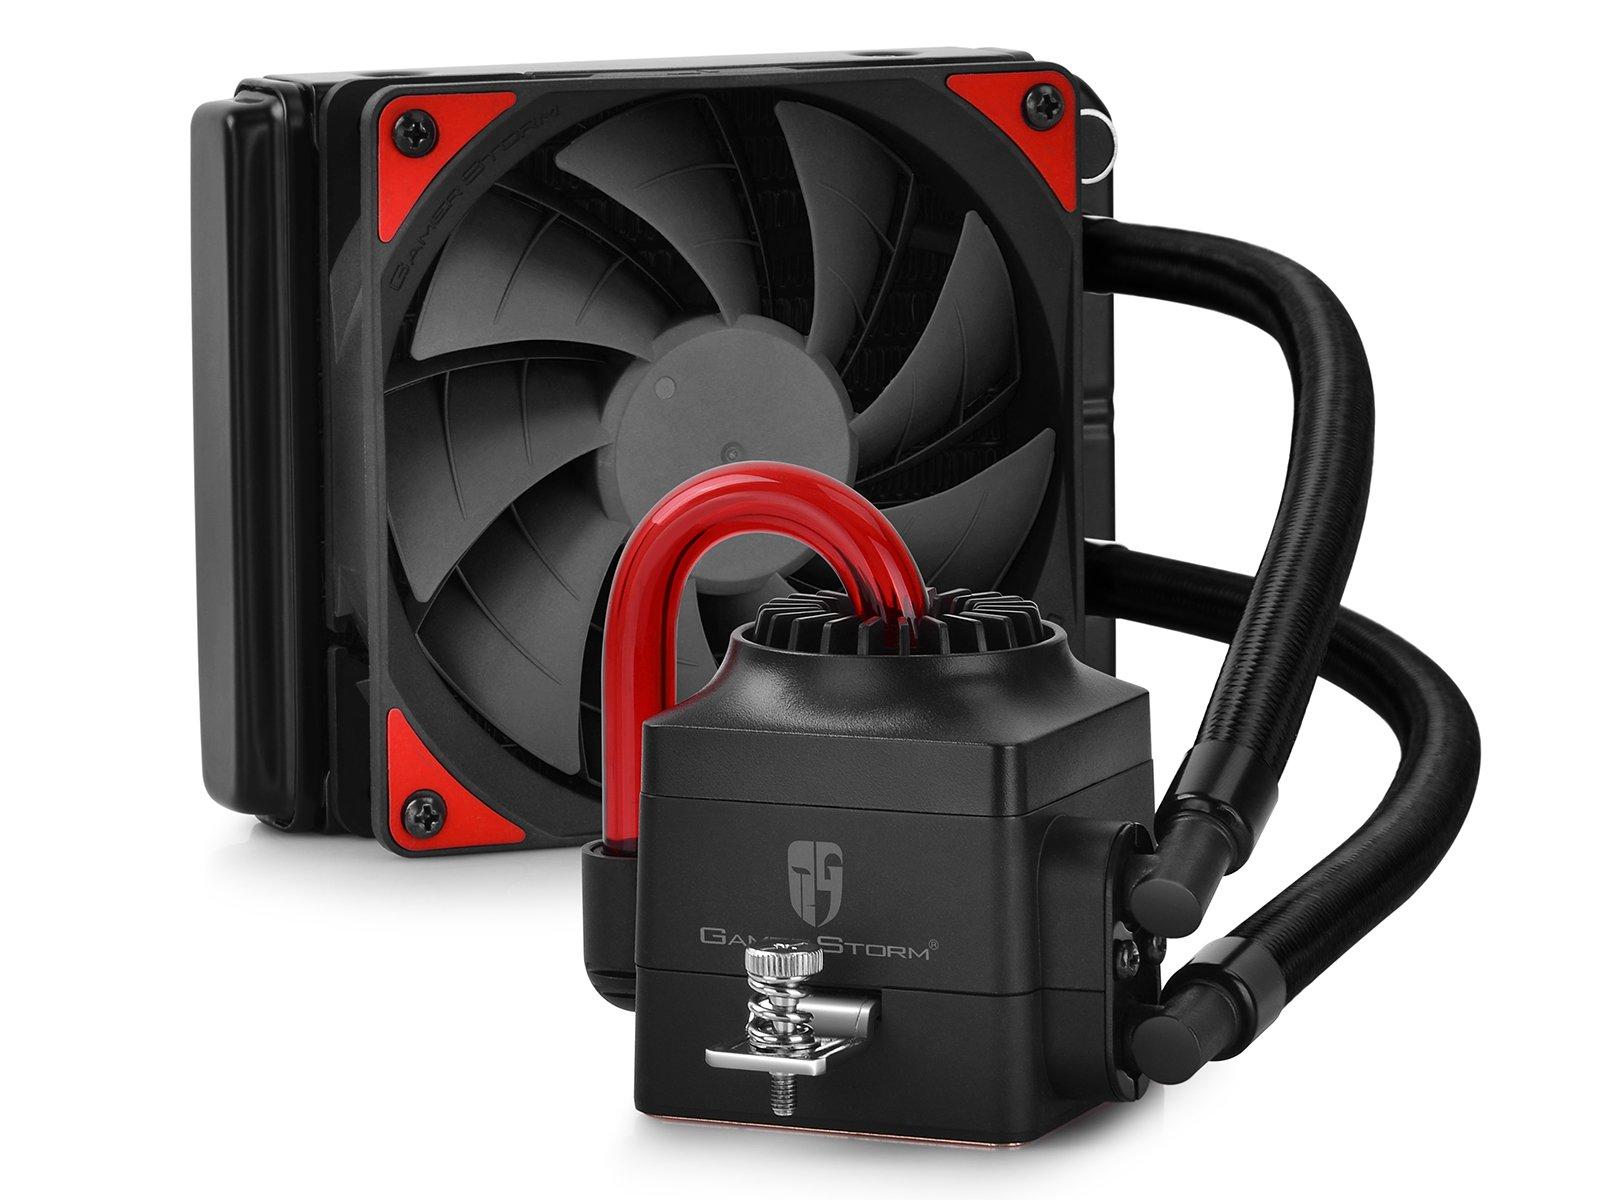 DeepCool Gamer Storm CPU Liquid Cooler AIO Water Cooling (CAPTAIN 120 EX)